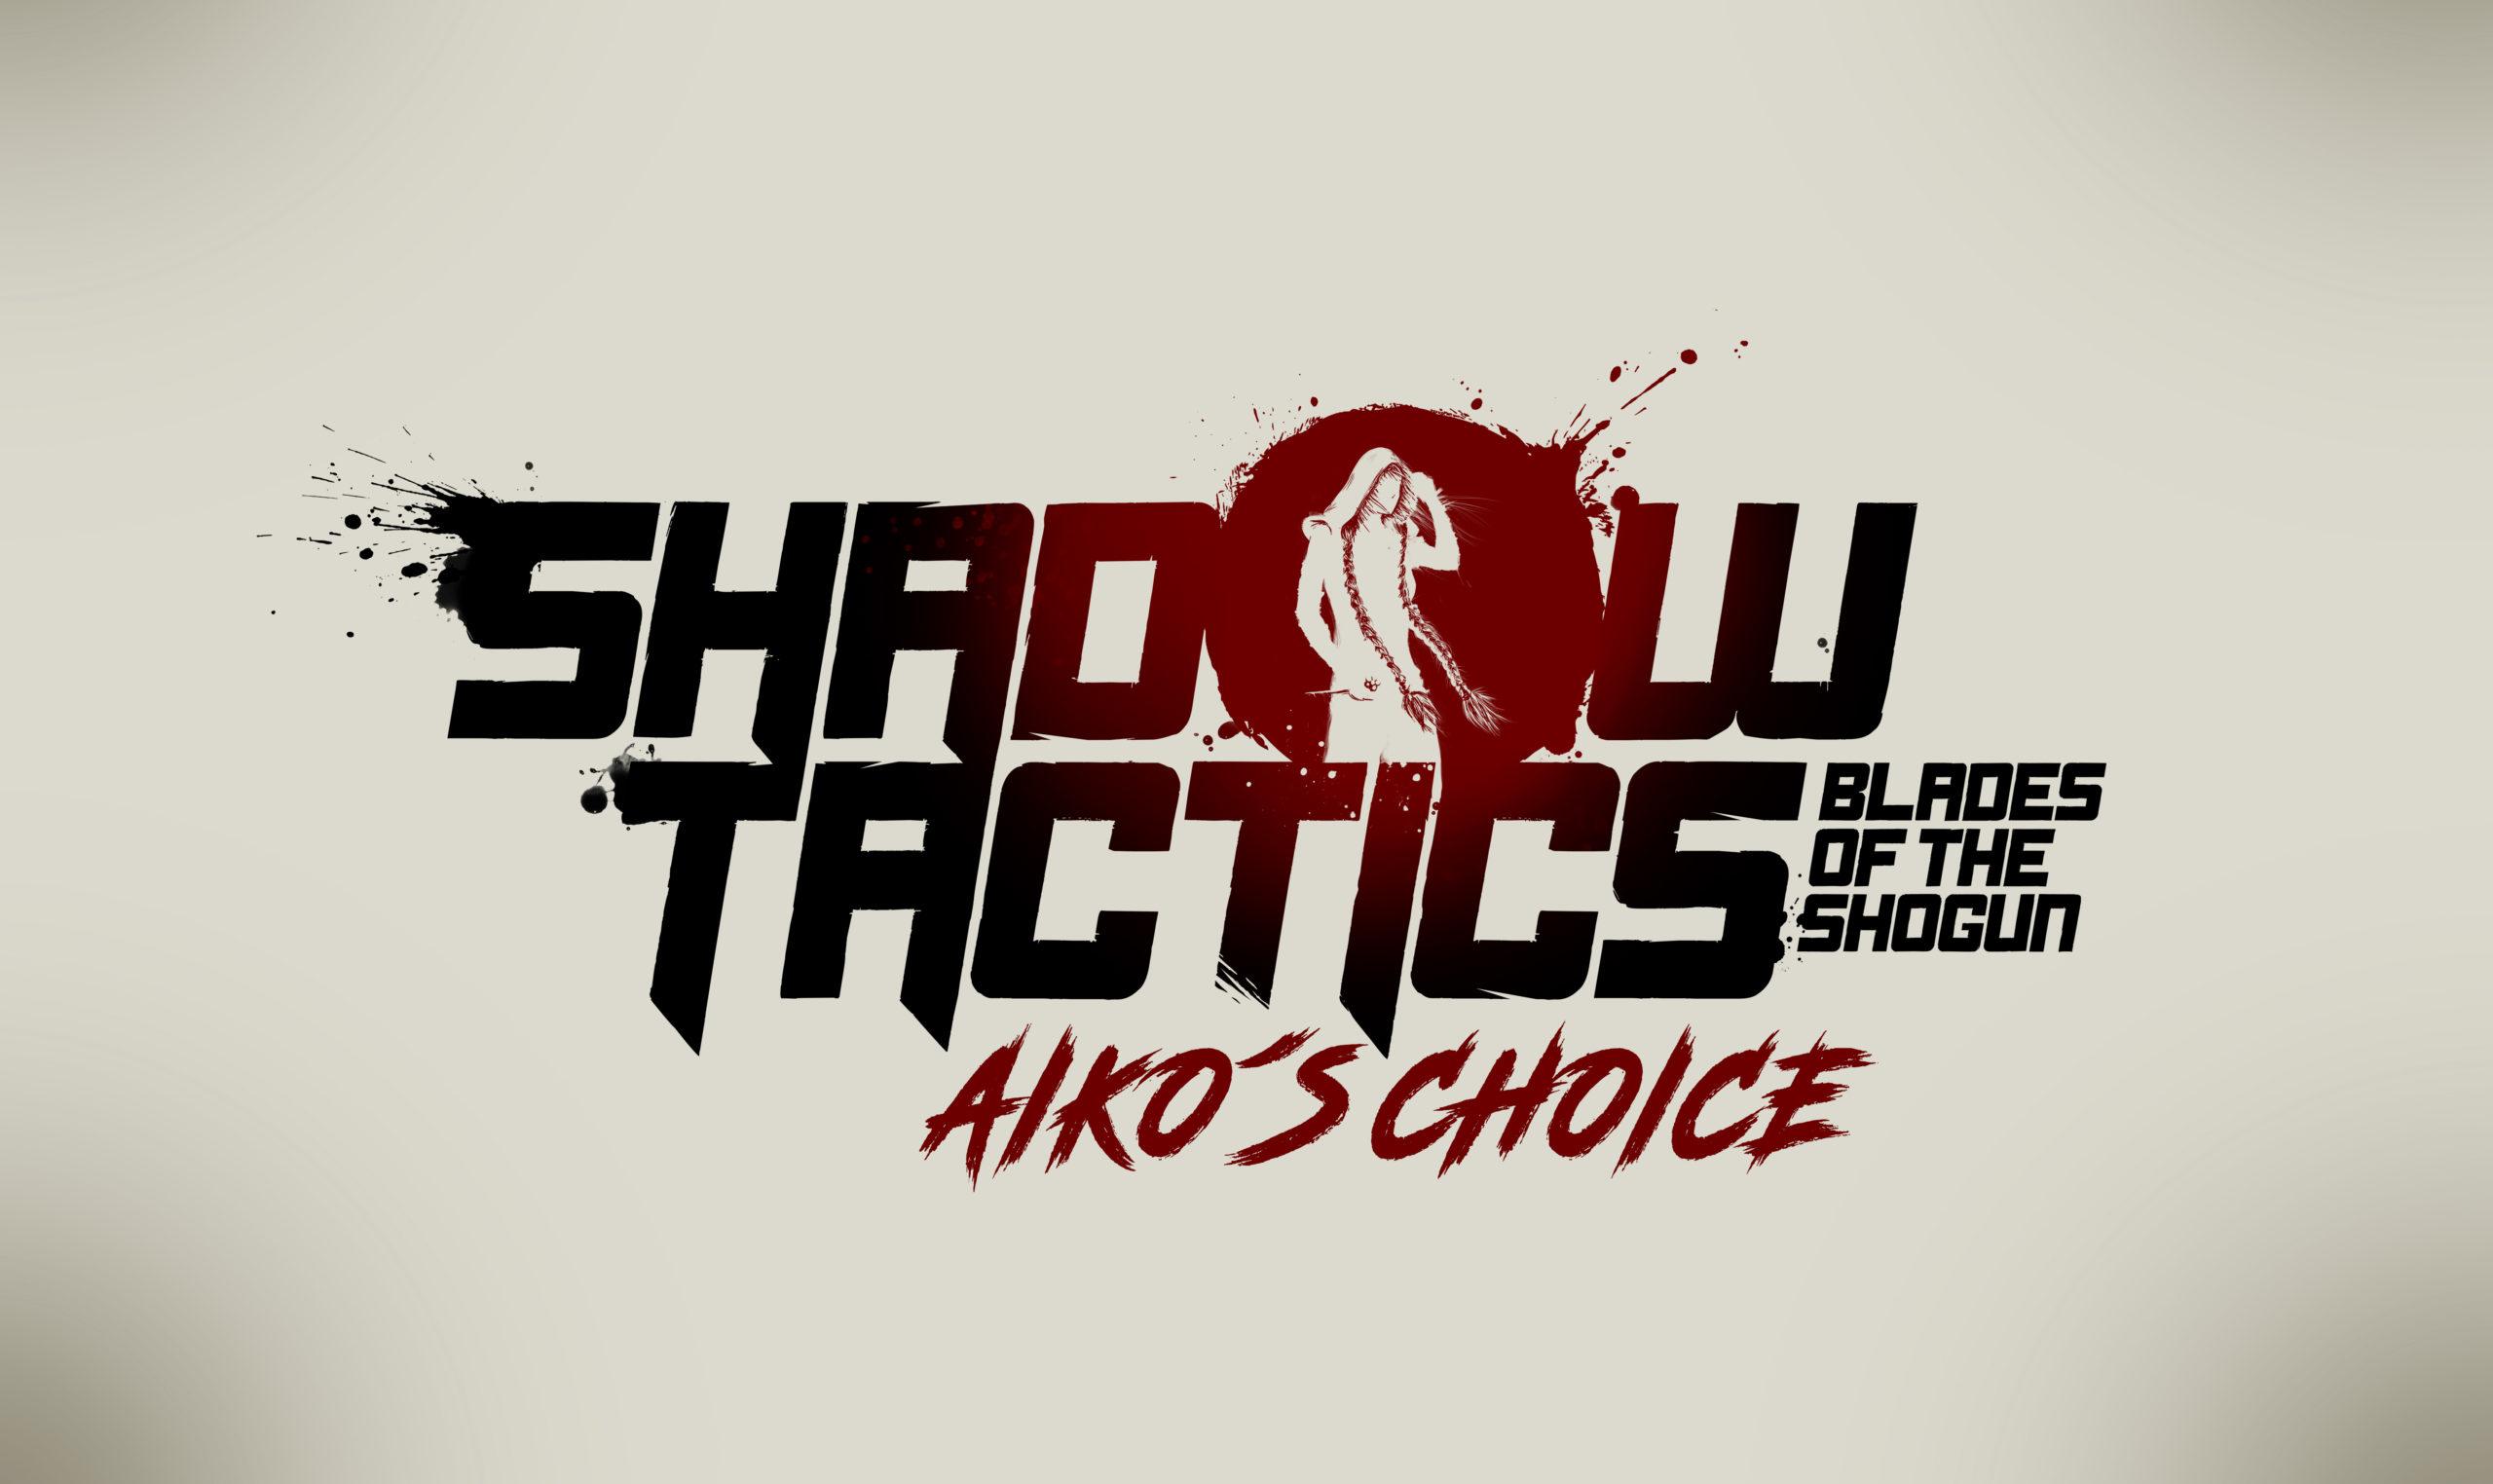 Aiko's Choice